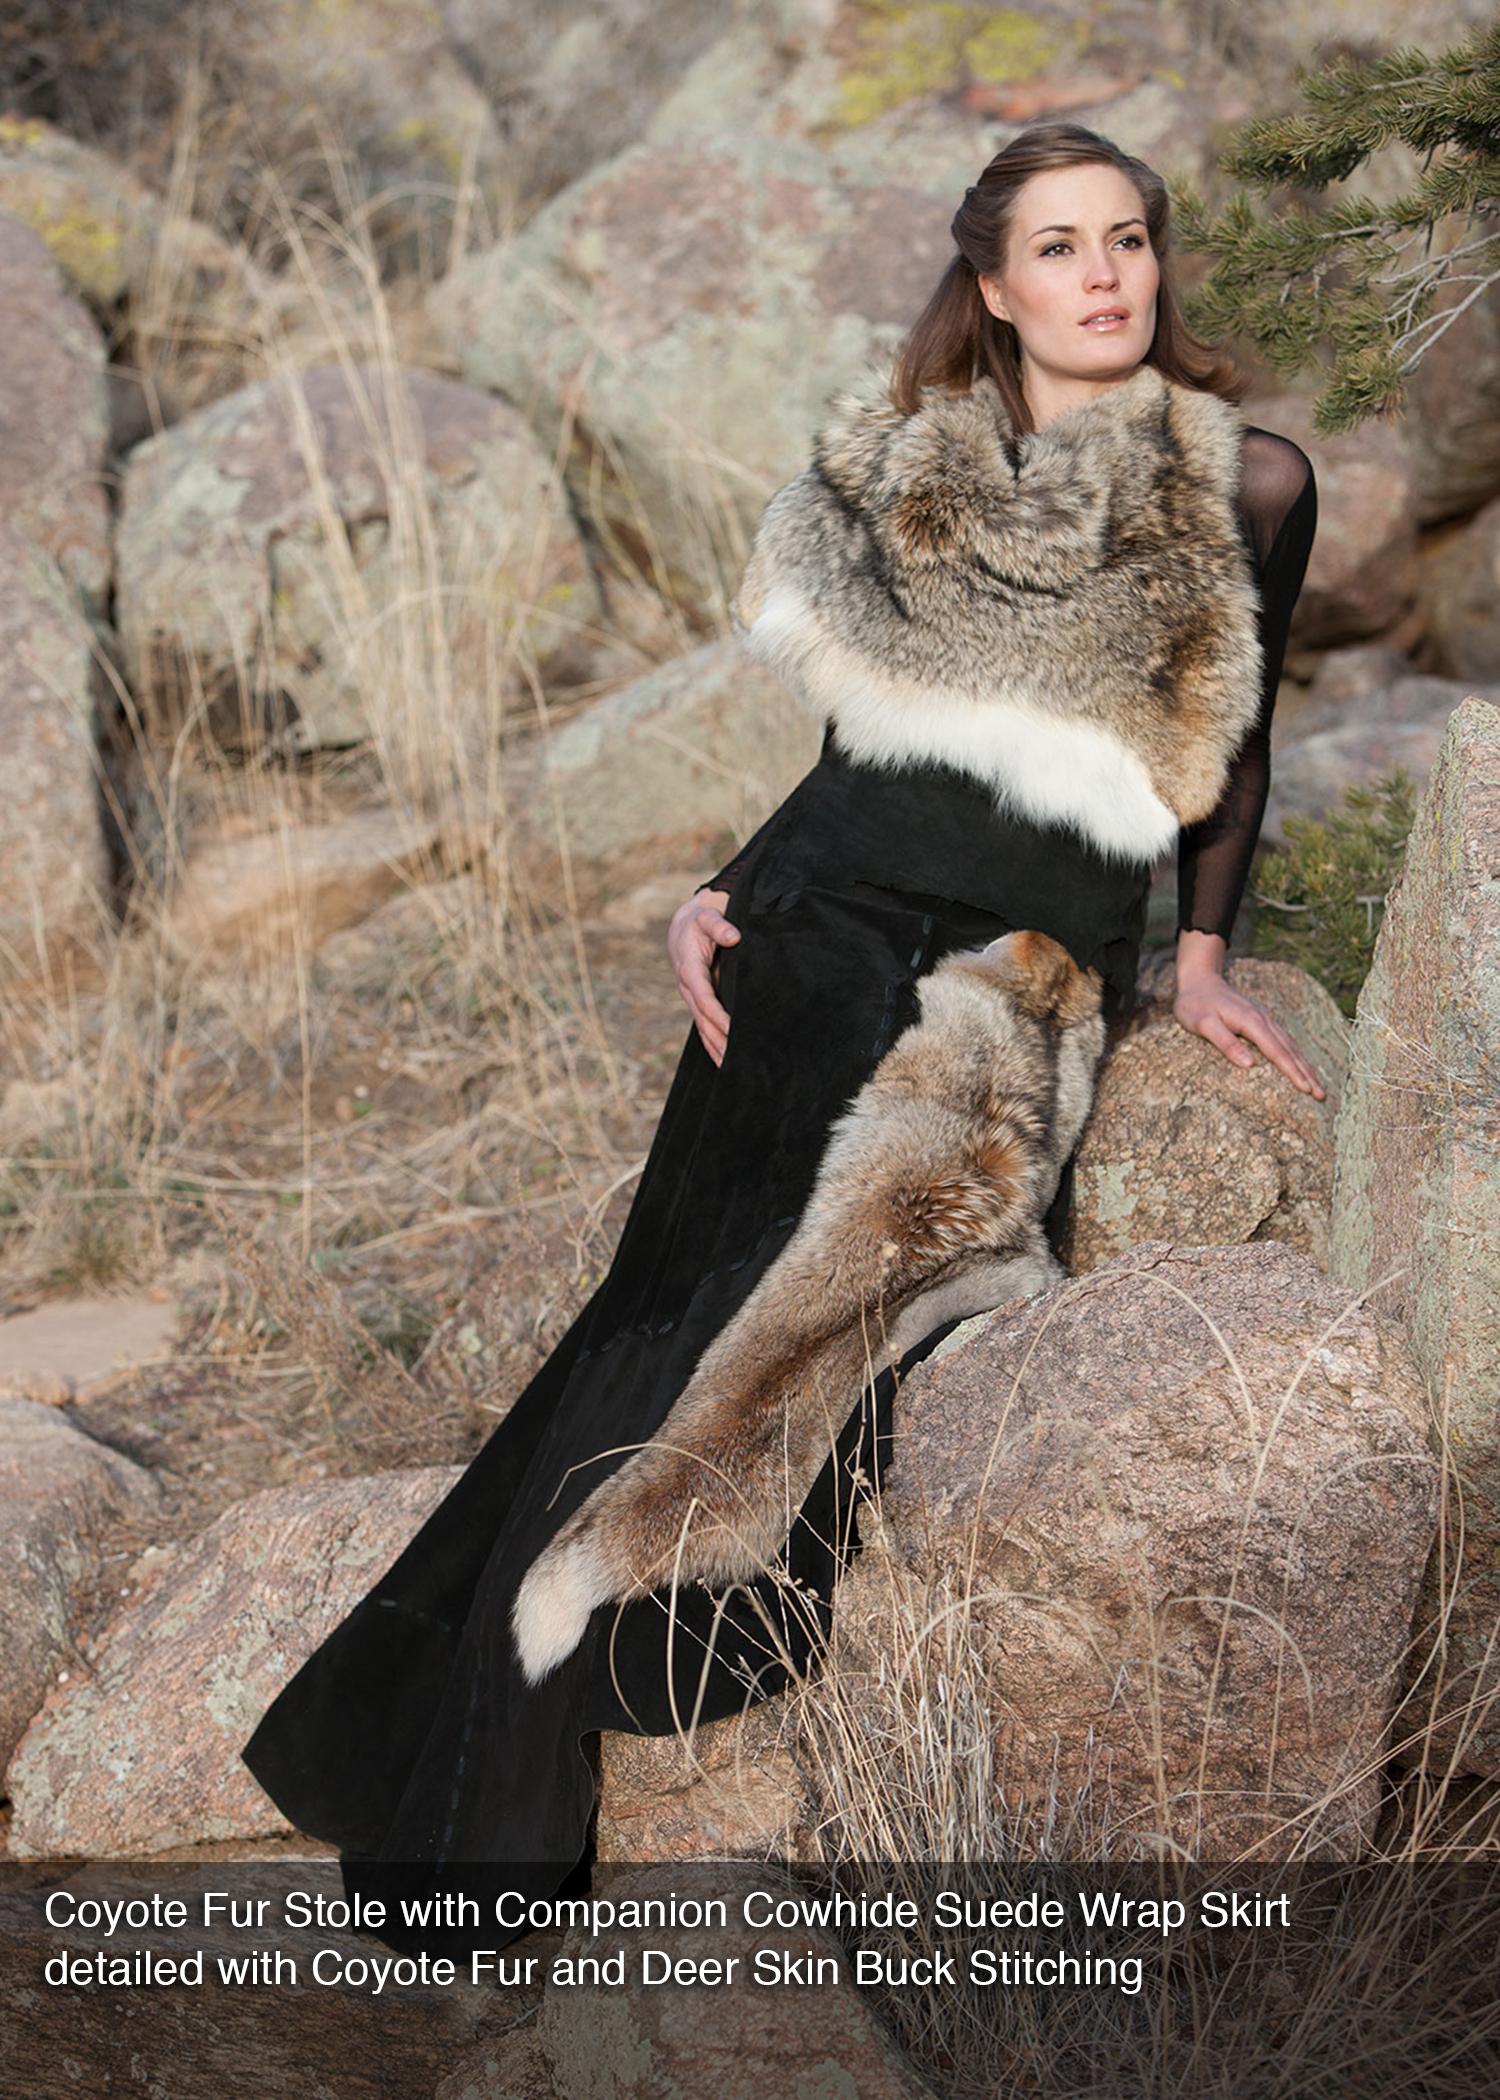 Coyote_Fur_Stole_3.jpg